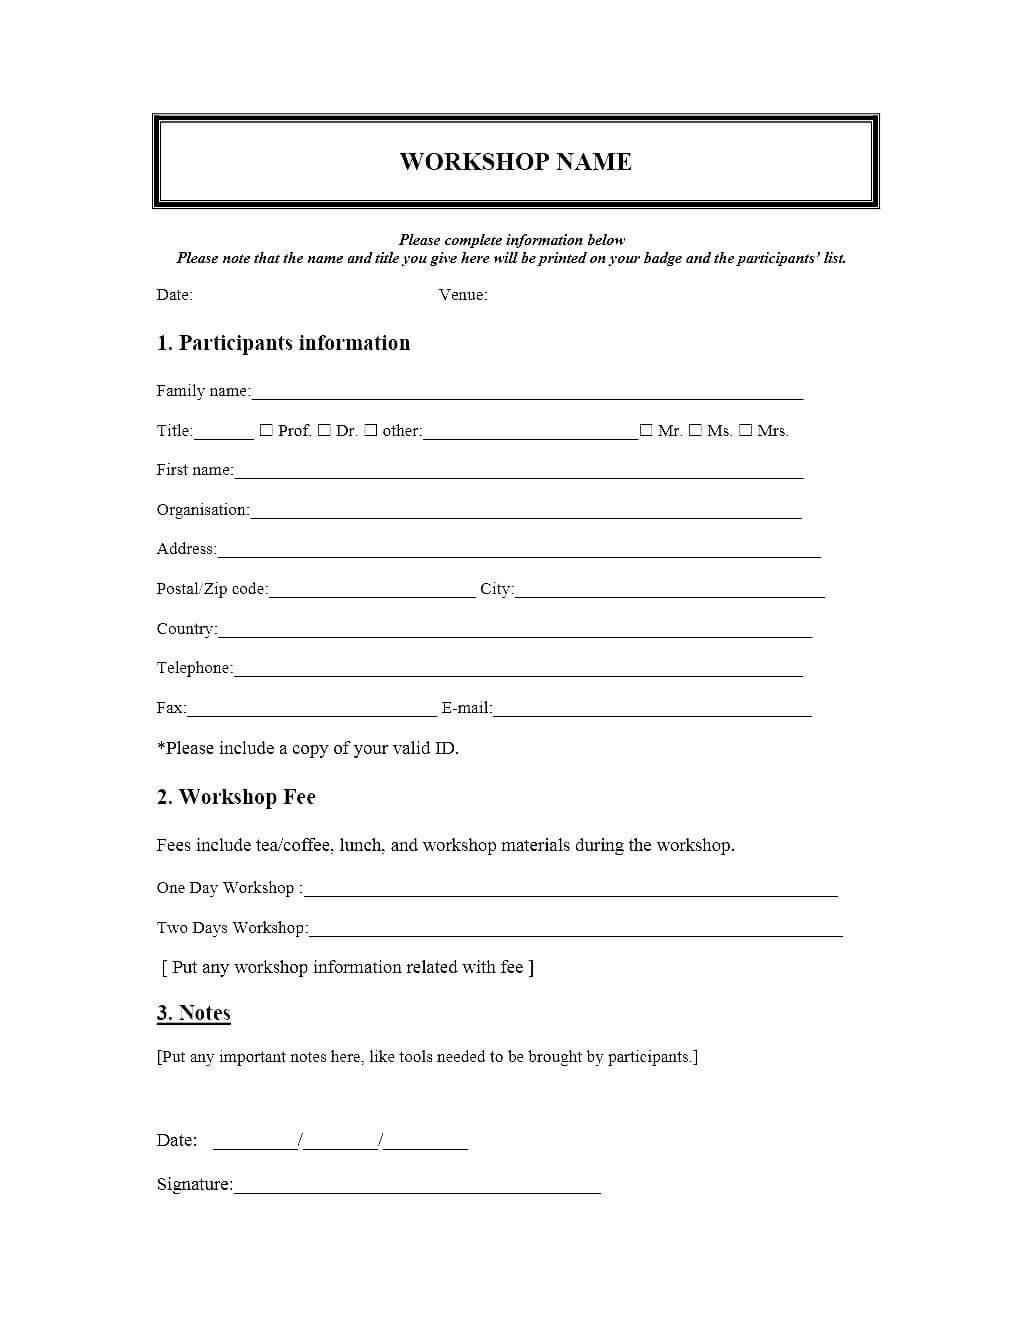 Event Registration Form Template Microsoft Word in School Registration Form Template Word